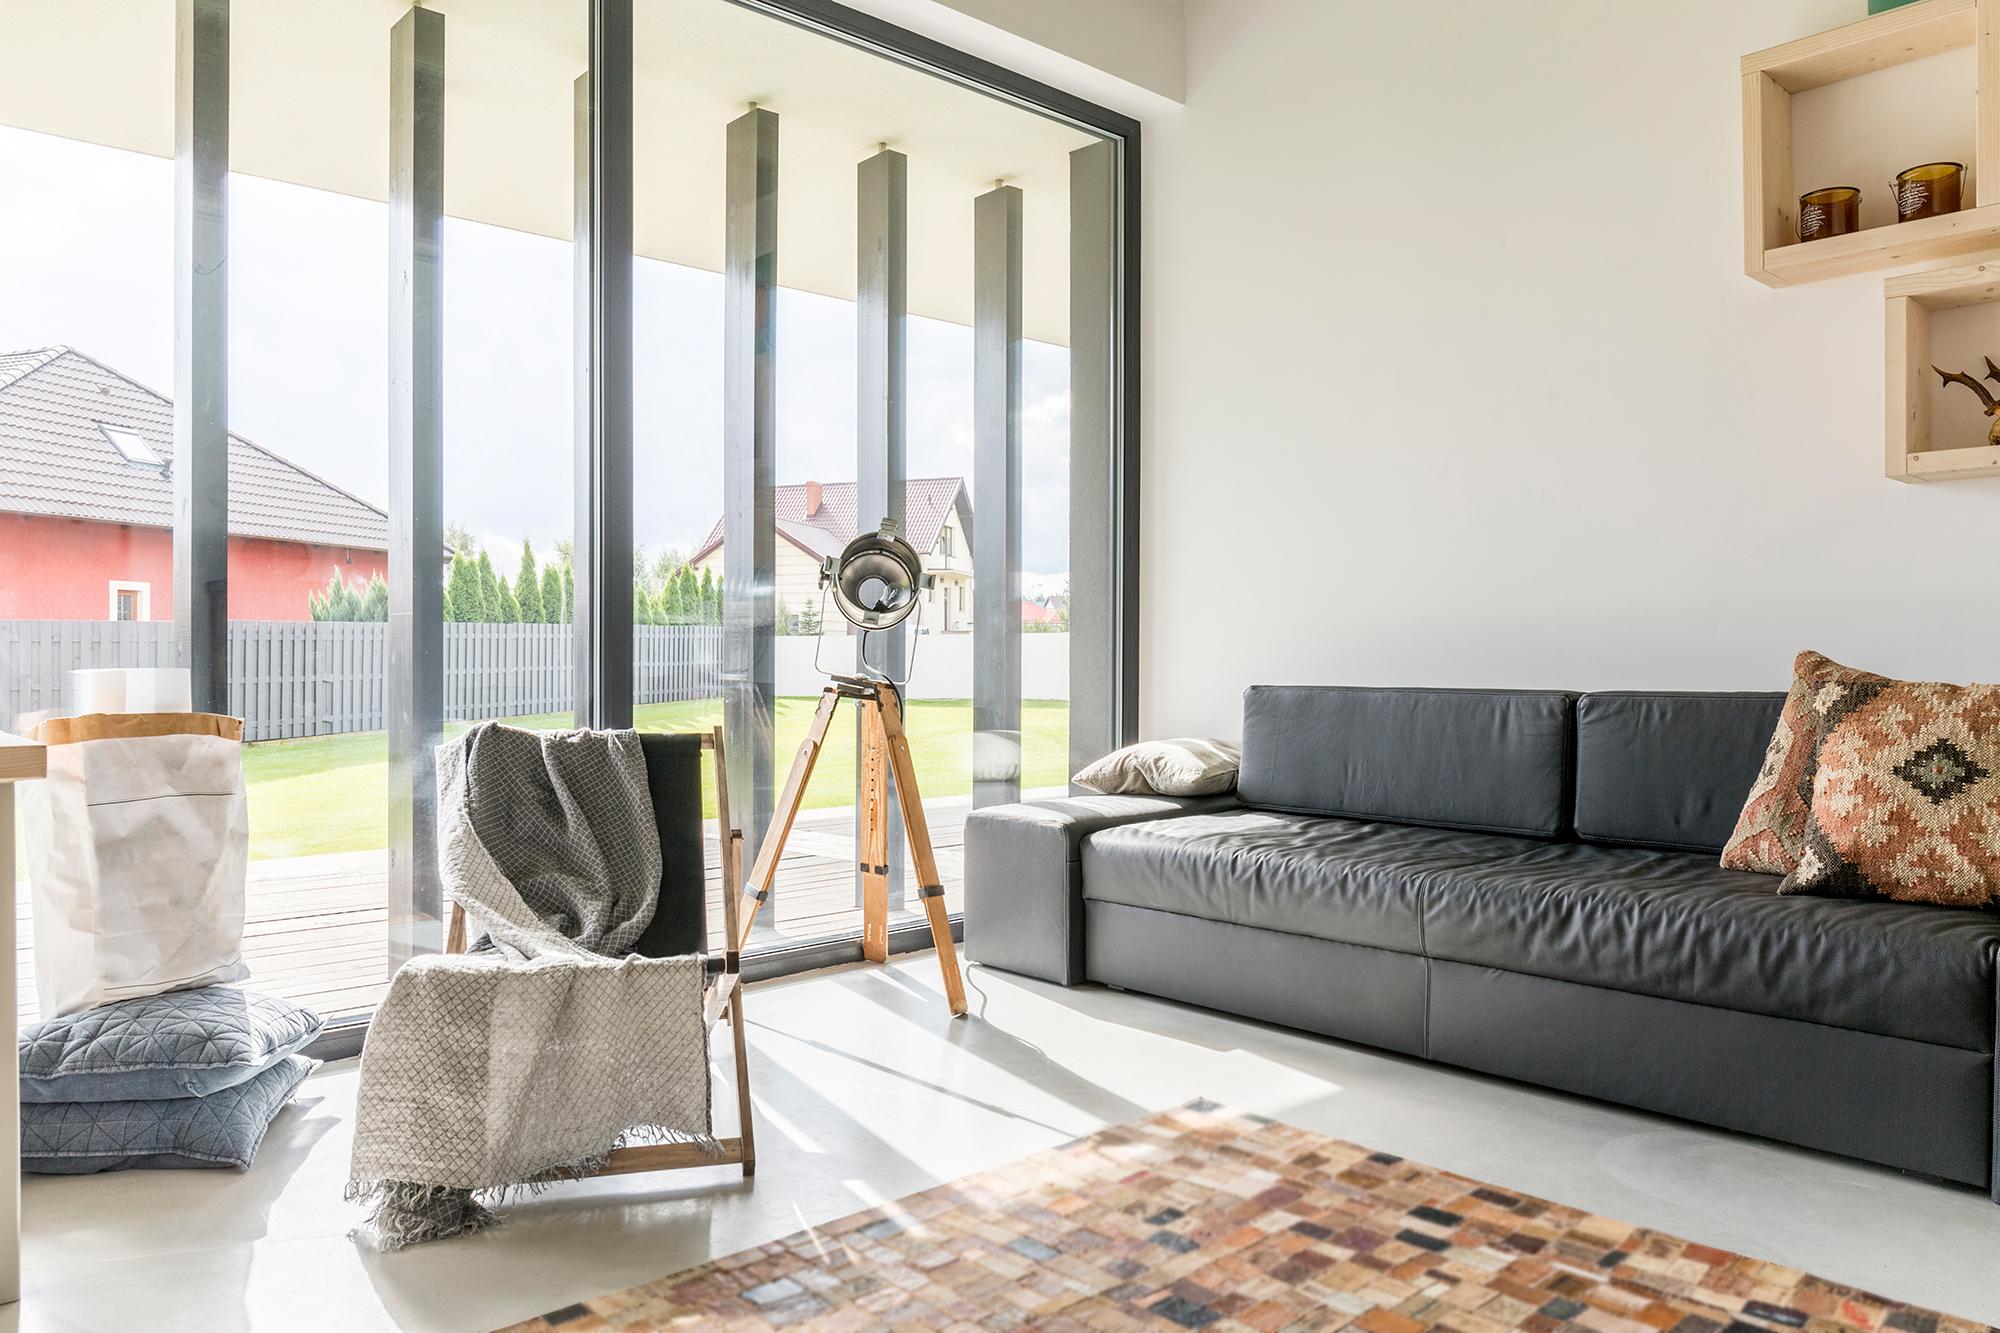 living-room-with-window-wall-PXHYA5X